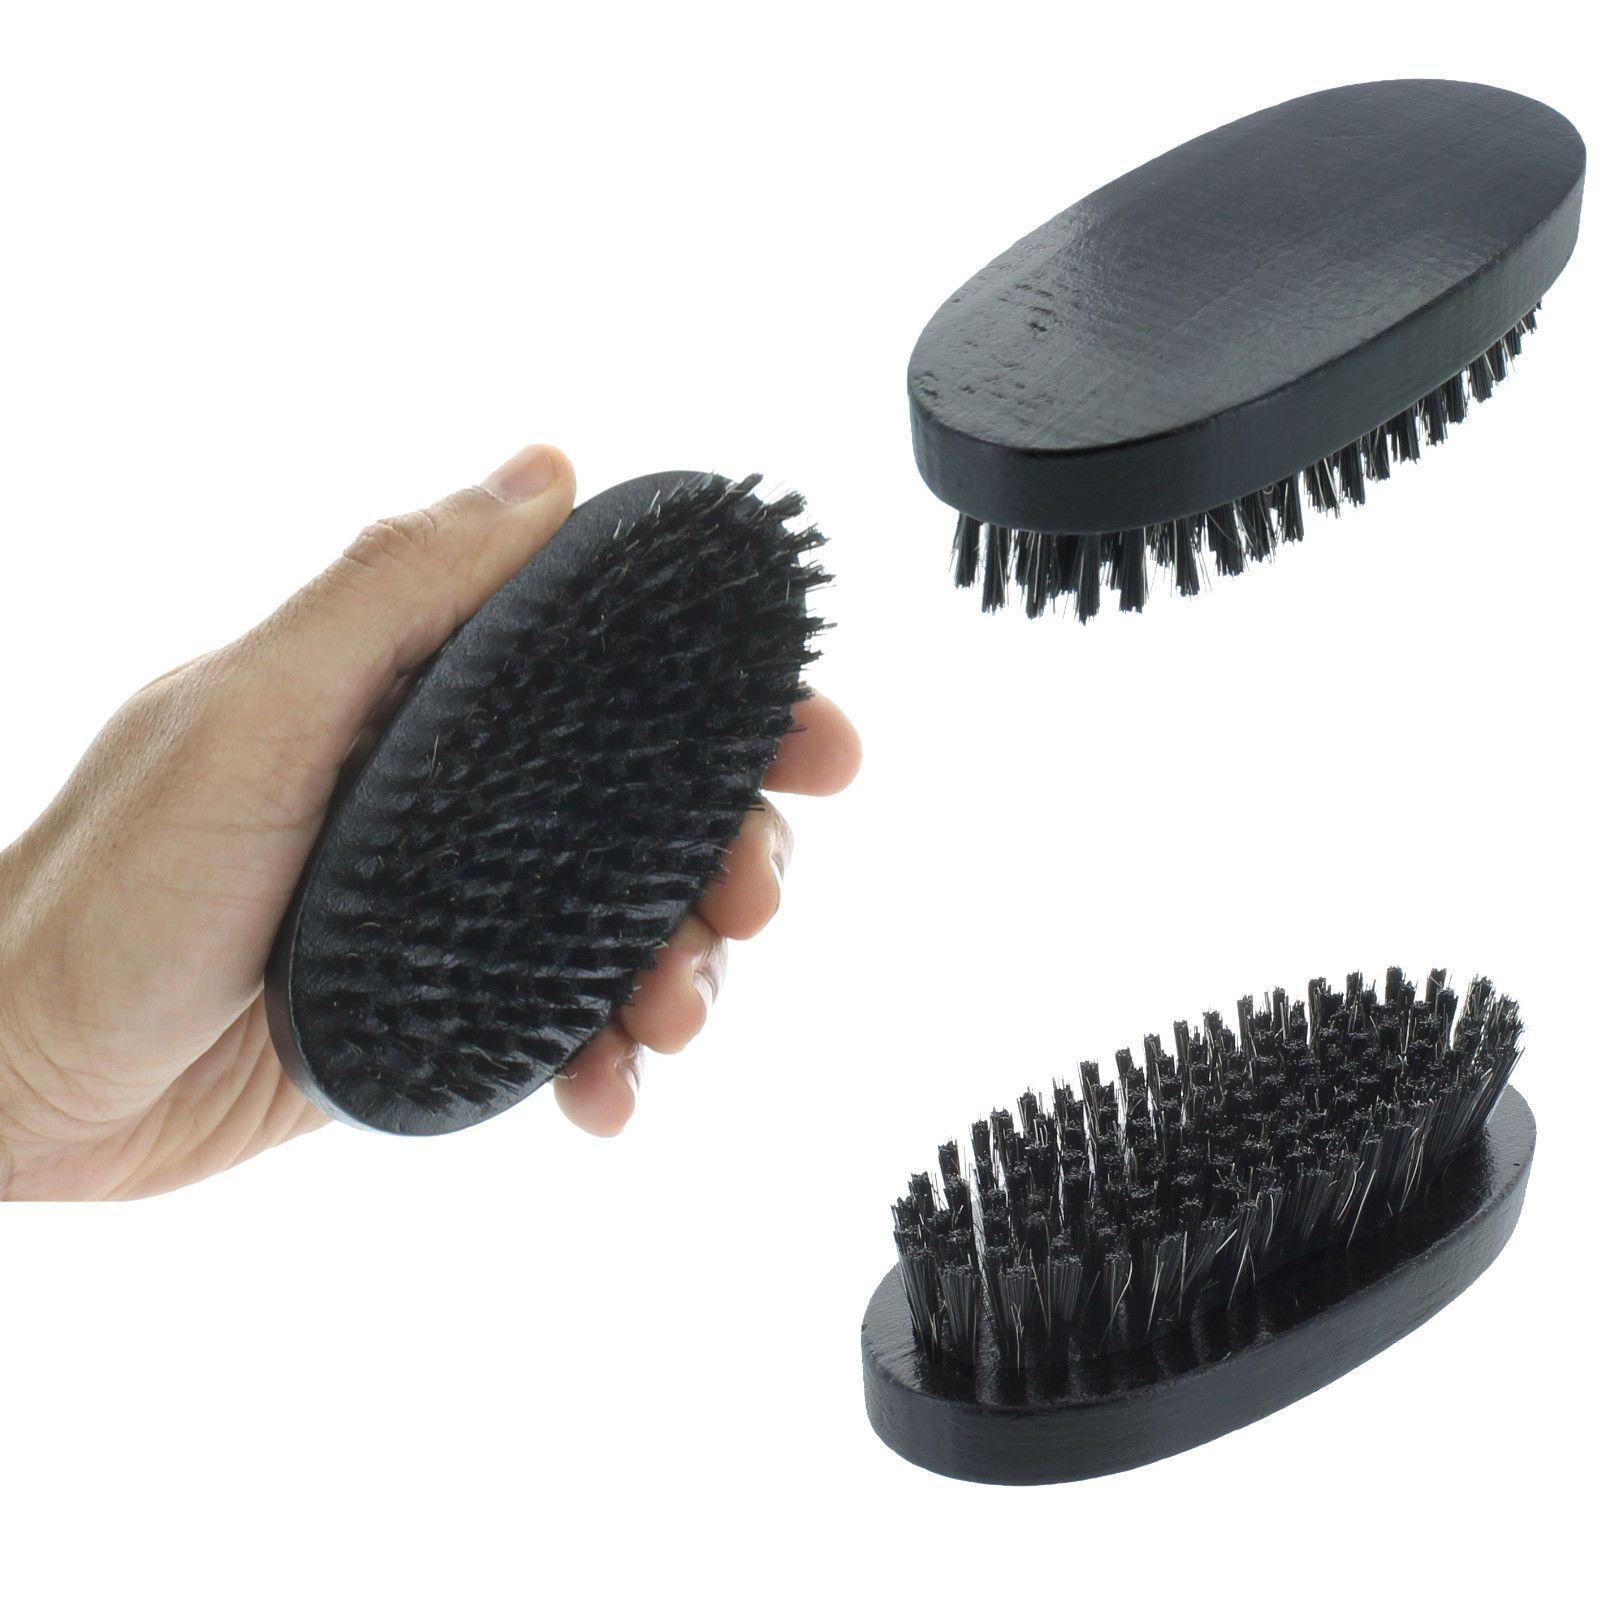 Reinforced Boar Bristles Soft Palm Brush Light Wood Handle